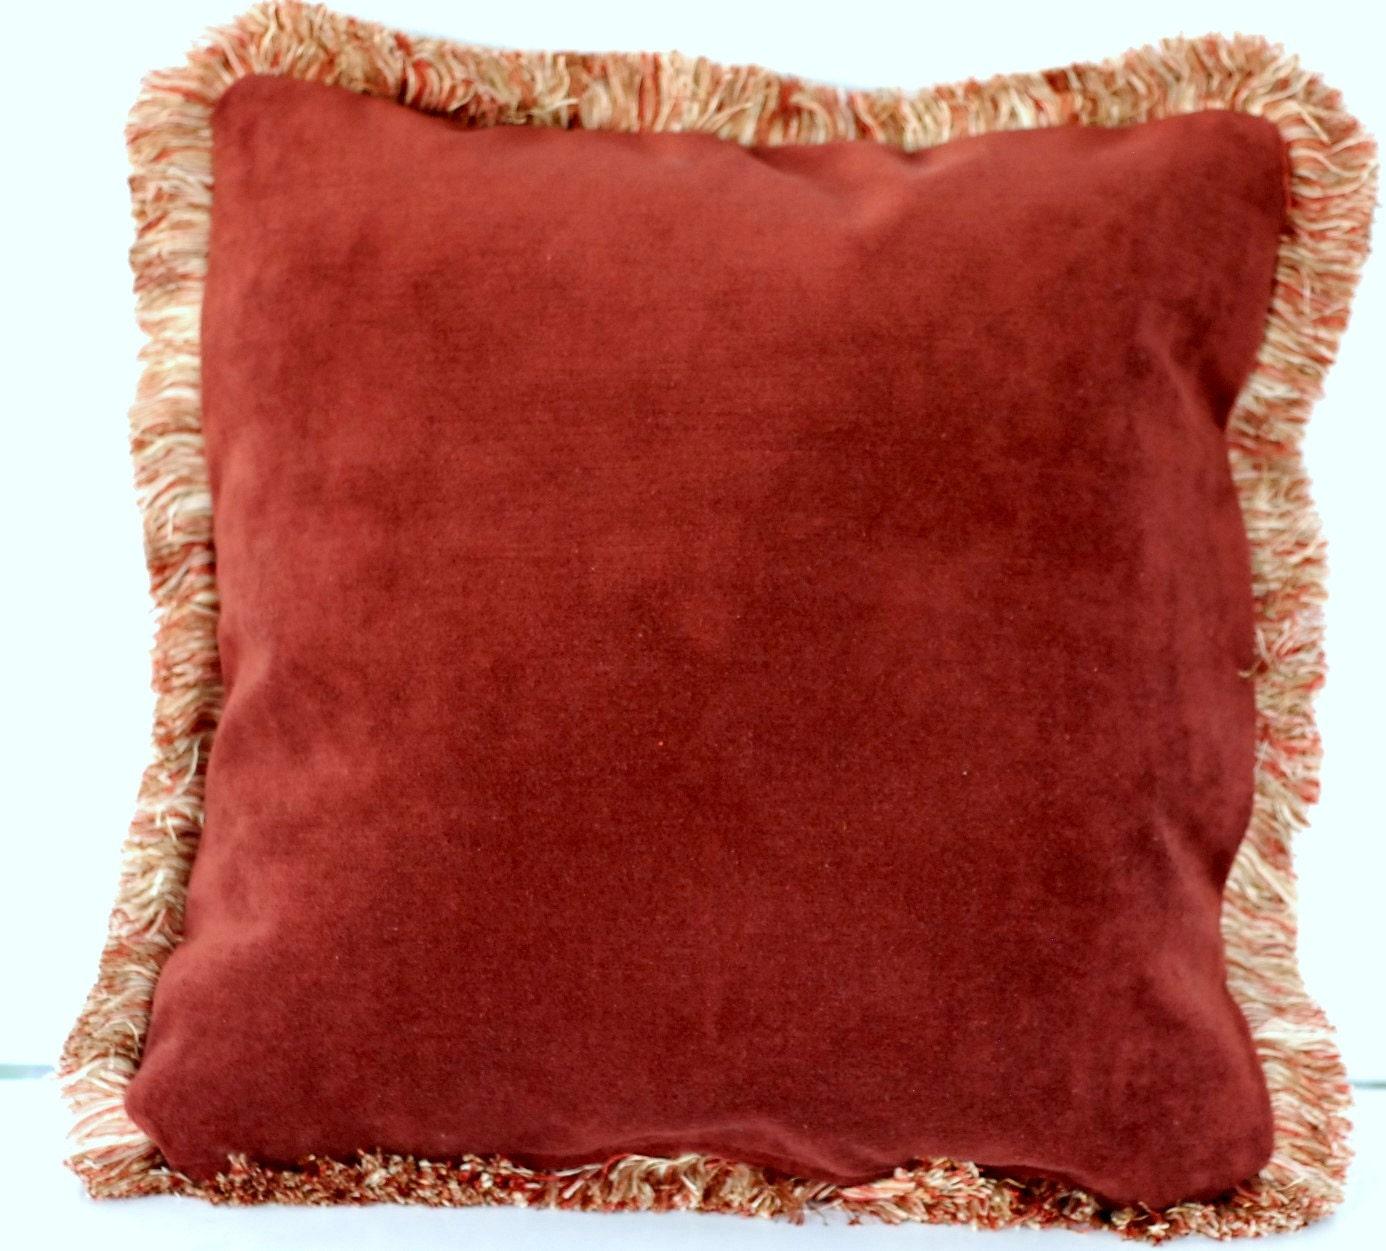 Large Velvet Decorative Throw Pillows With Fringe For Sofa